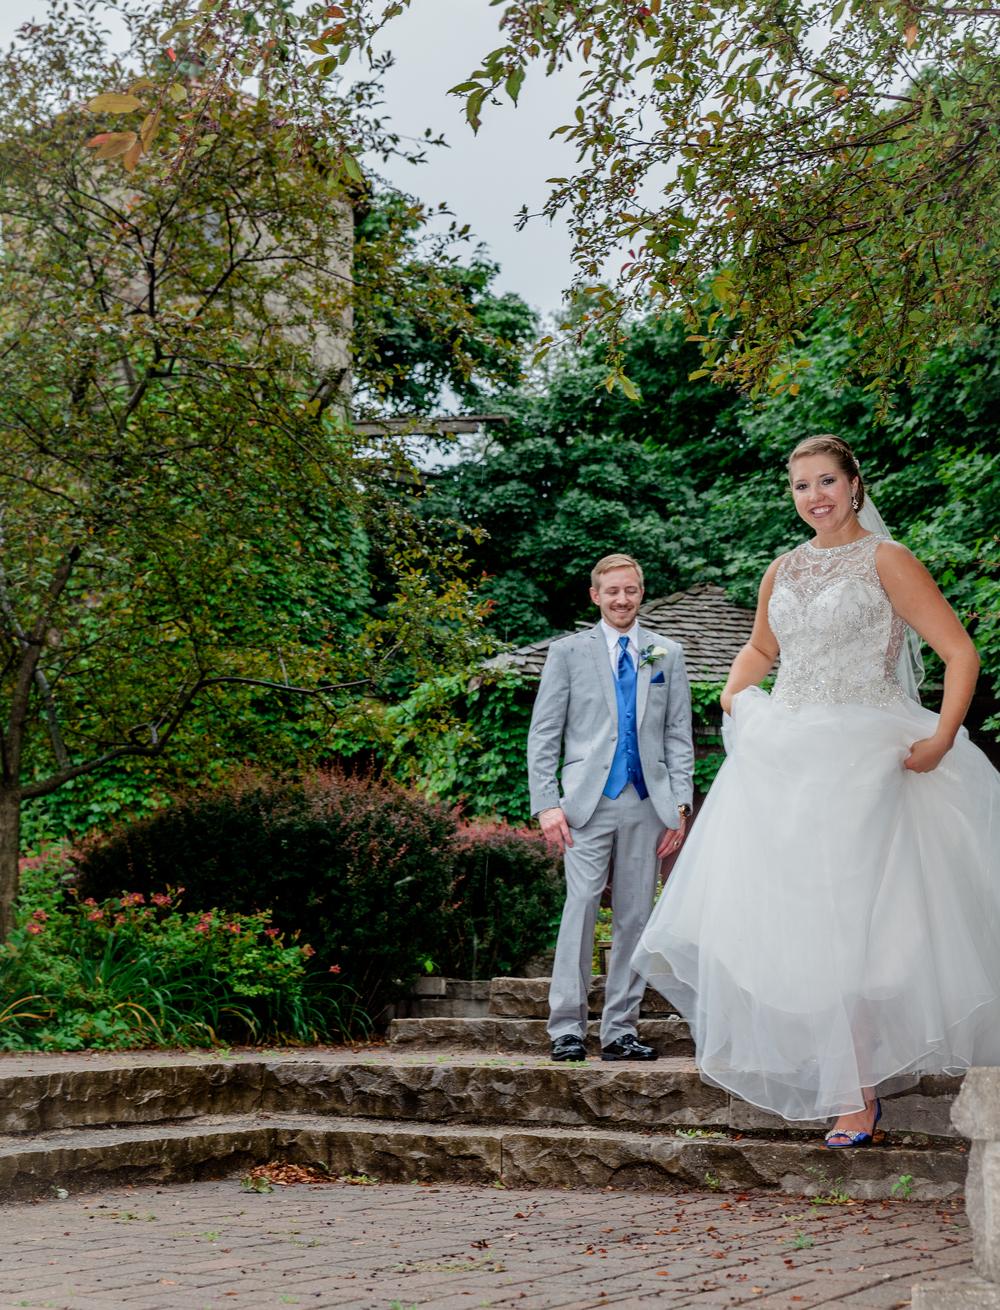 Brian+Jill Wedding Sneak Peak (134 of 149).jpg